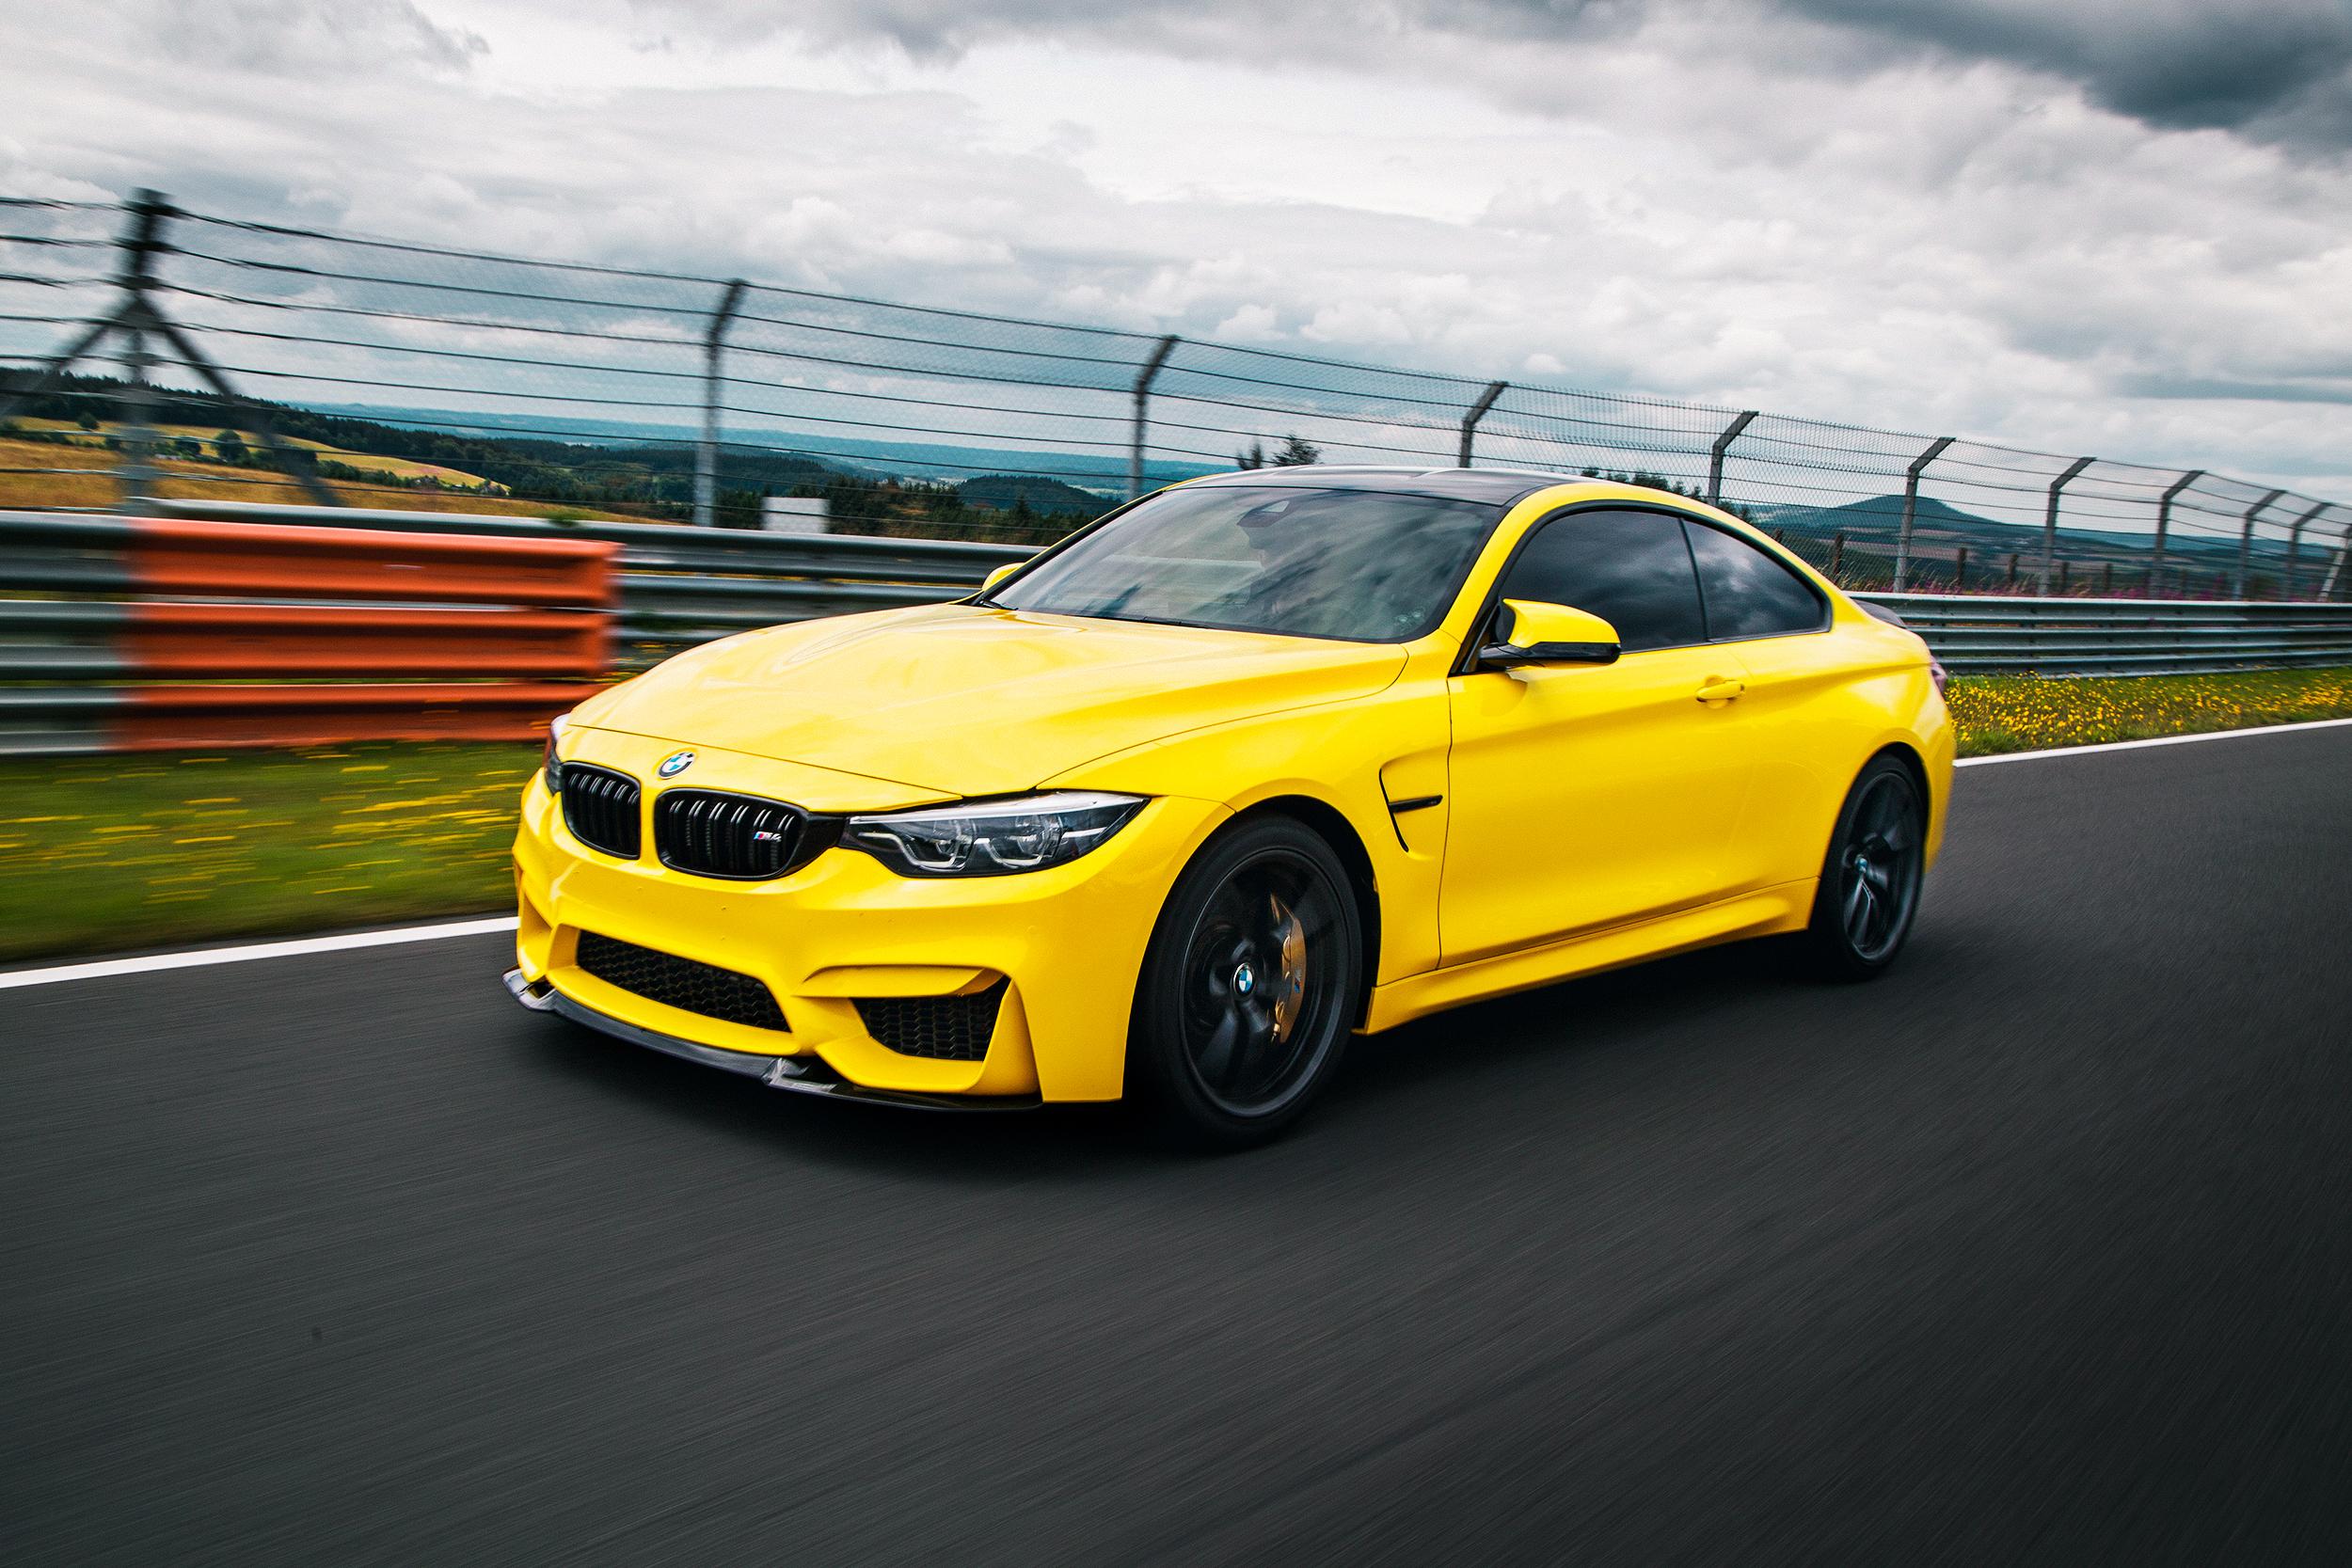 BMW-NRing-02.jpg